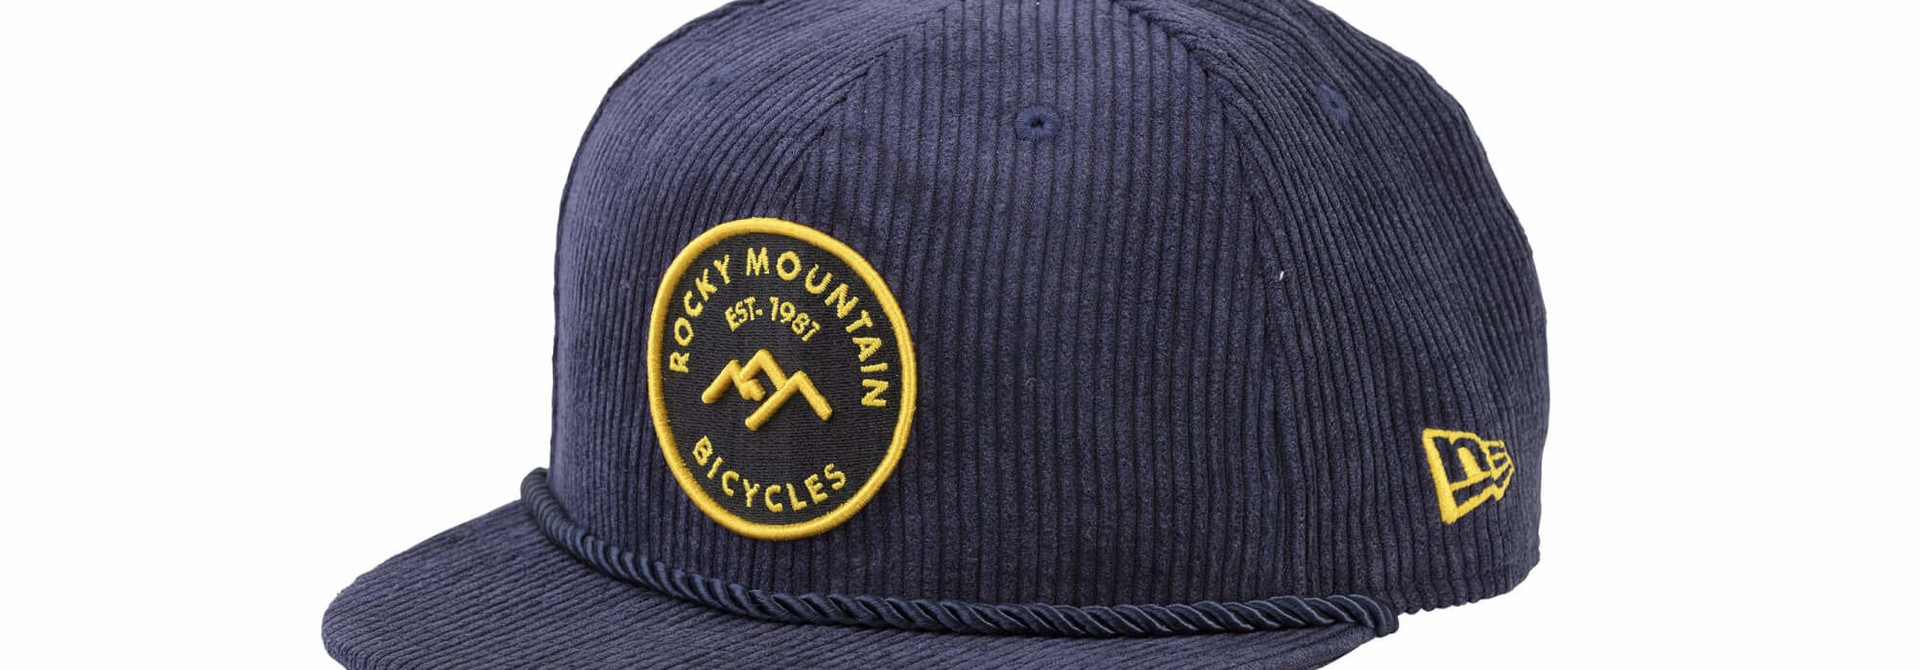 Corduroy TV Edition Hat